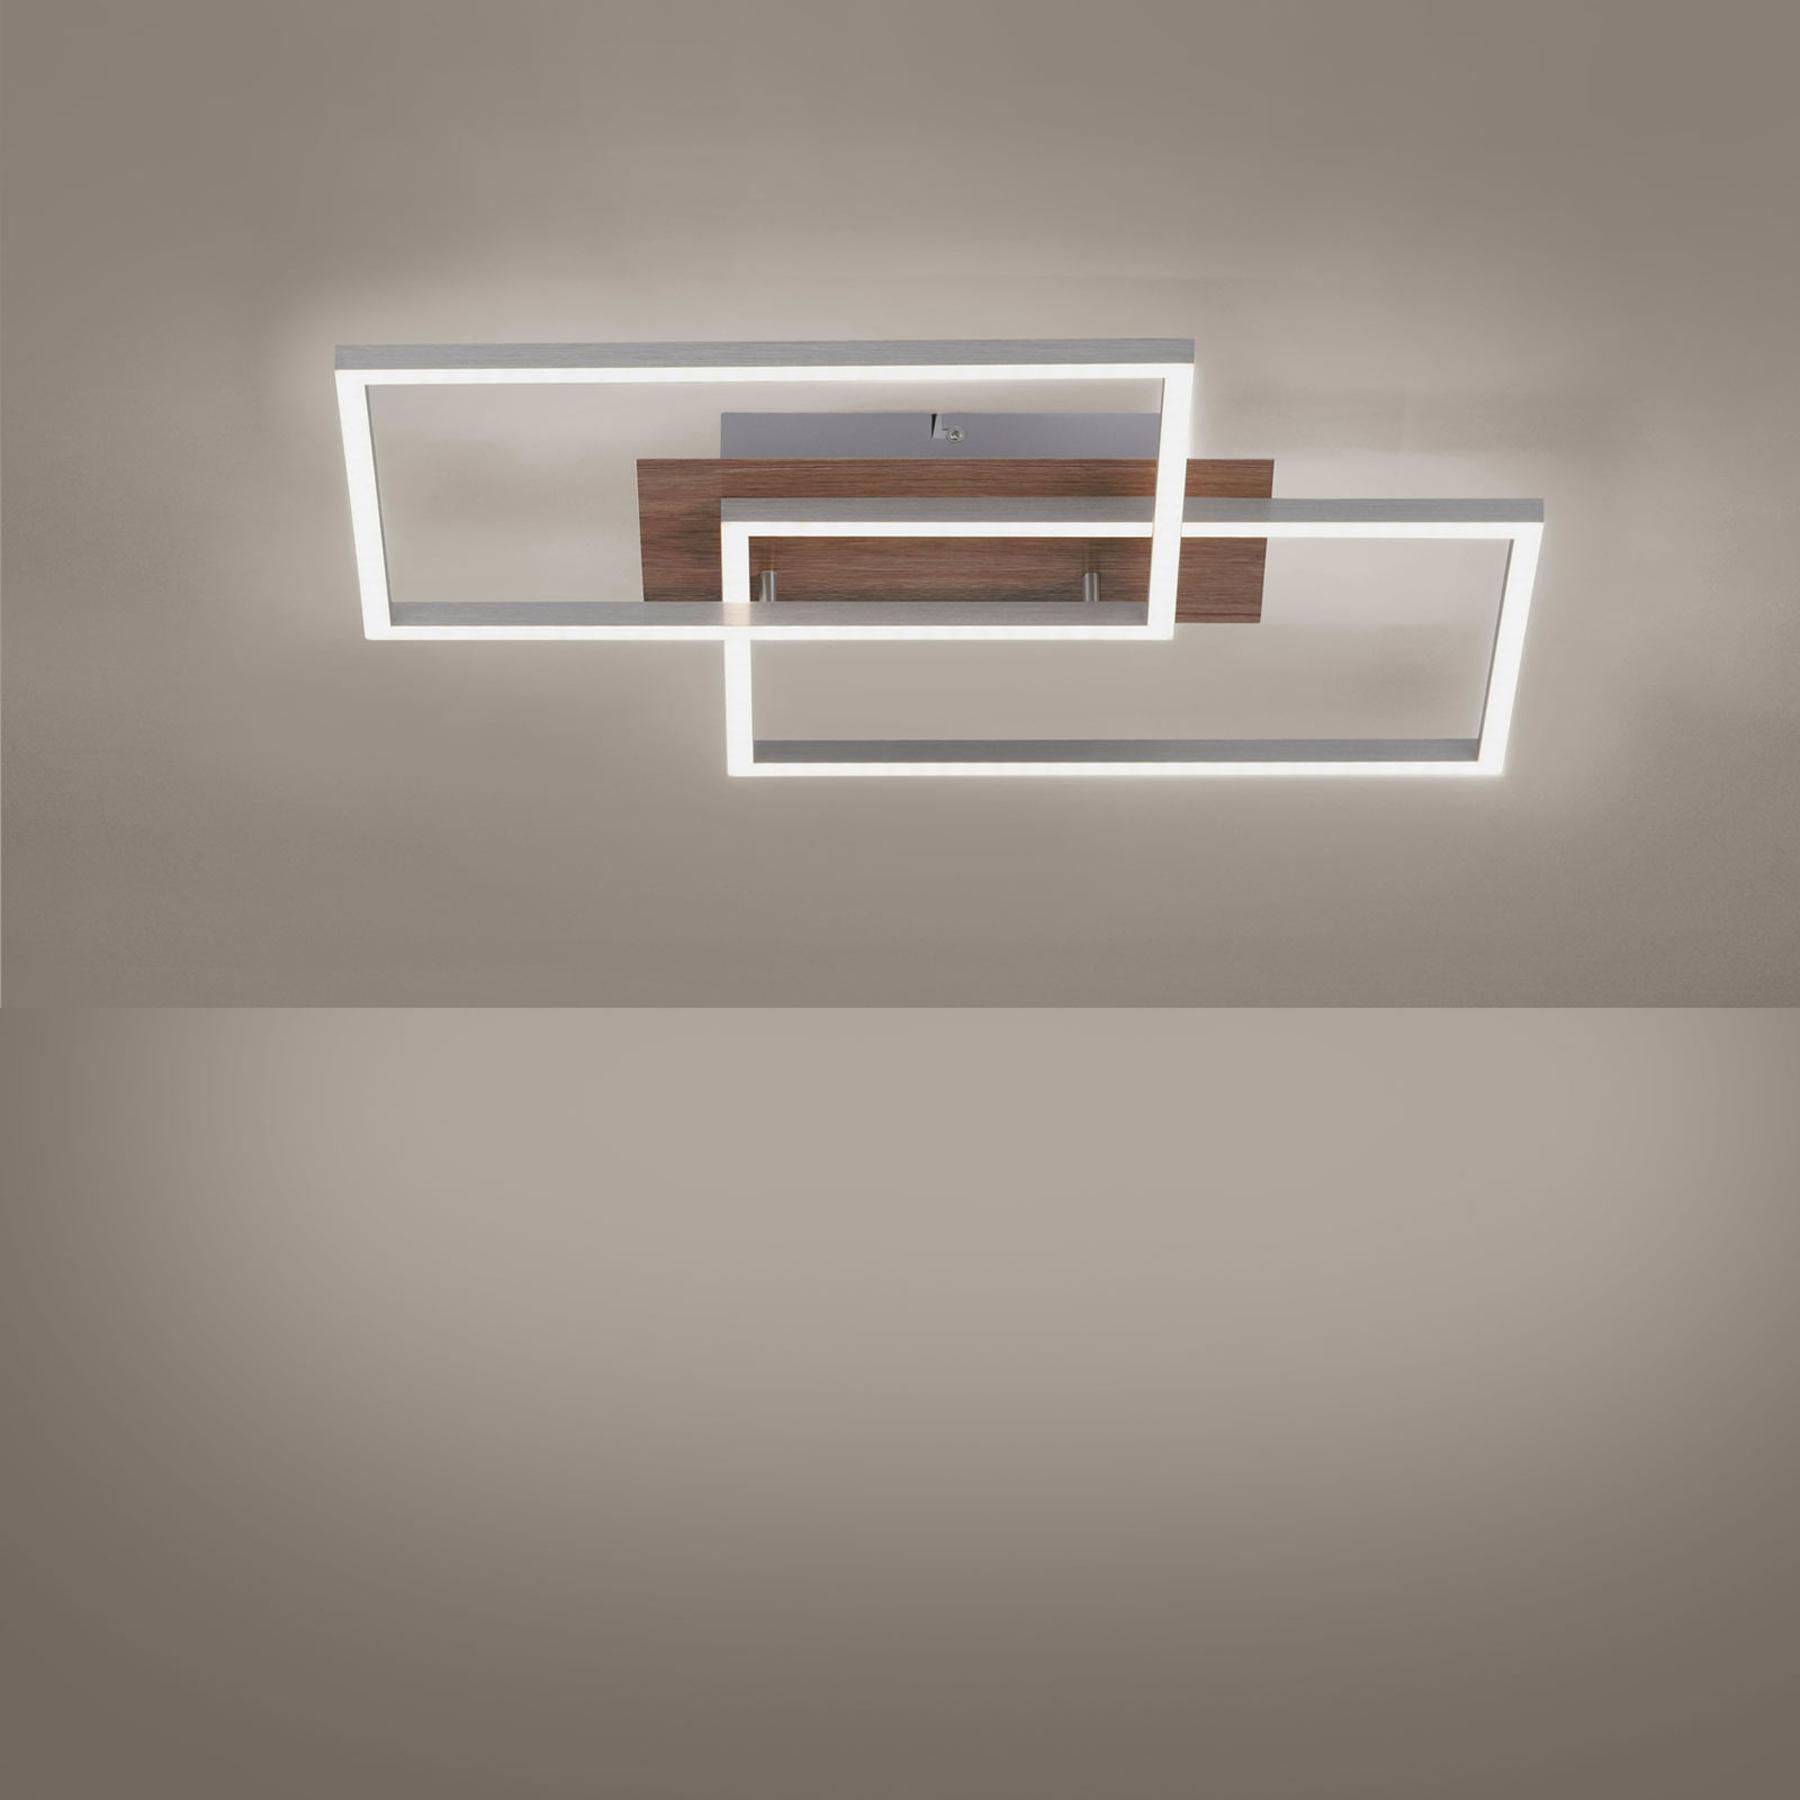 Lampa sufitowa LED Iven drewno/stal 2Fl kwadrat